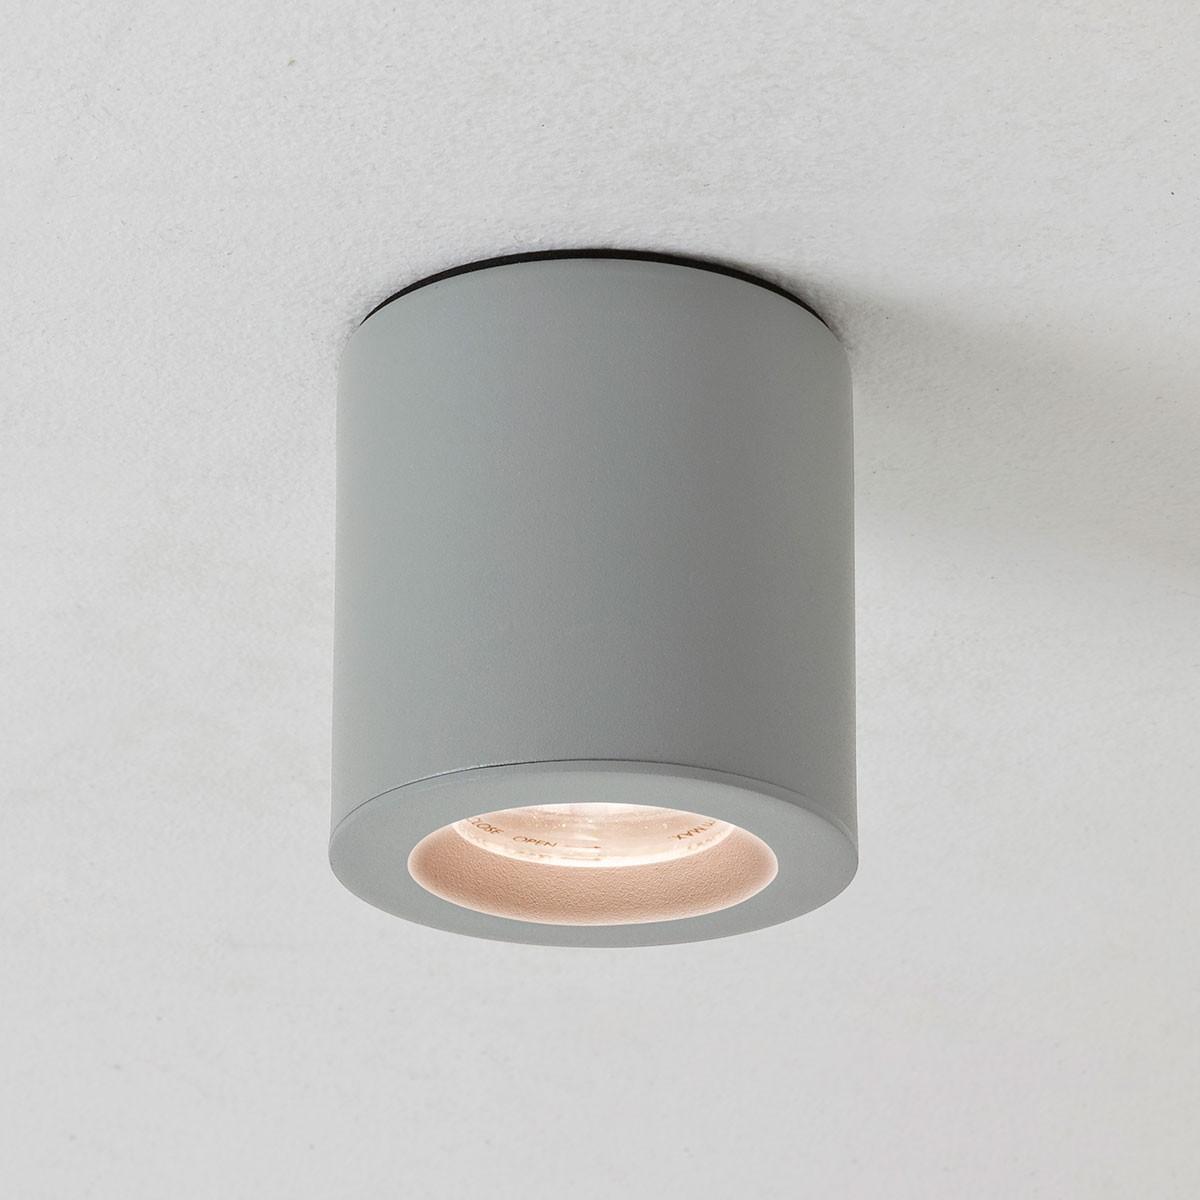 Bathroom Ceiling Lights Gu10 : Astro kos gu led cfl painted silver bathroom downlight at uk electrical supplies